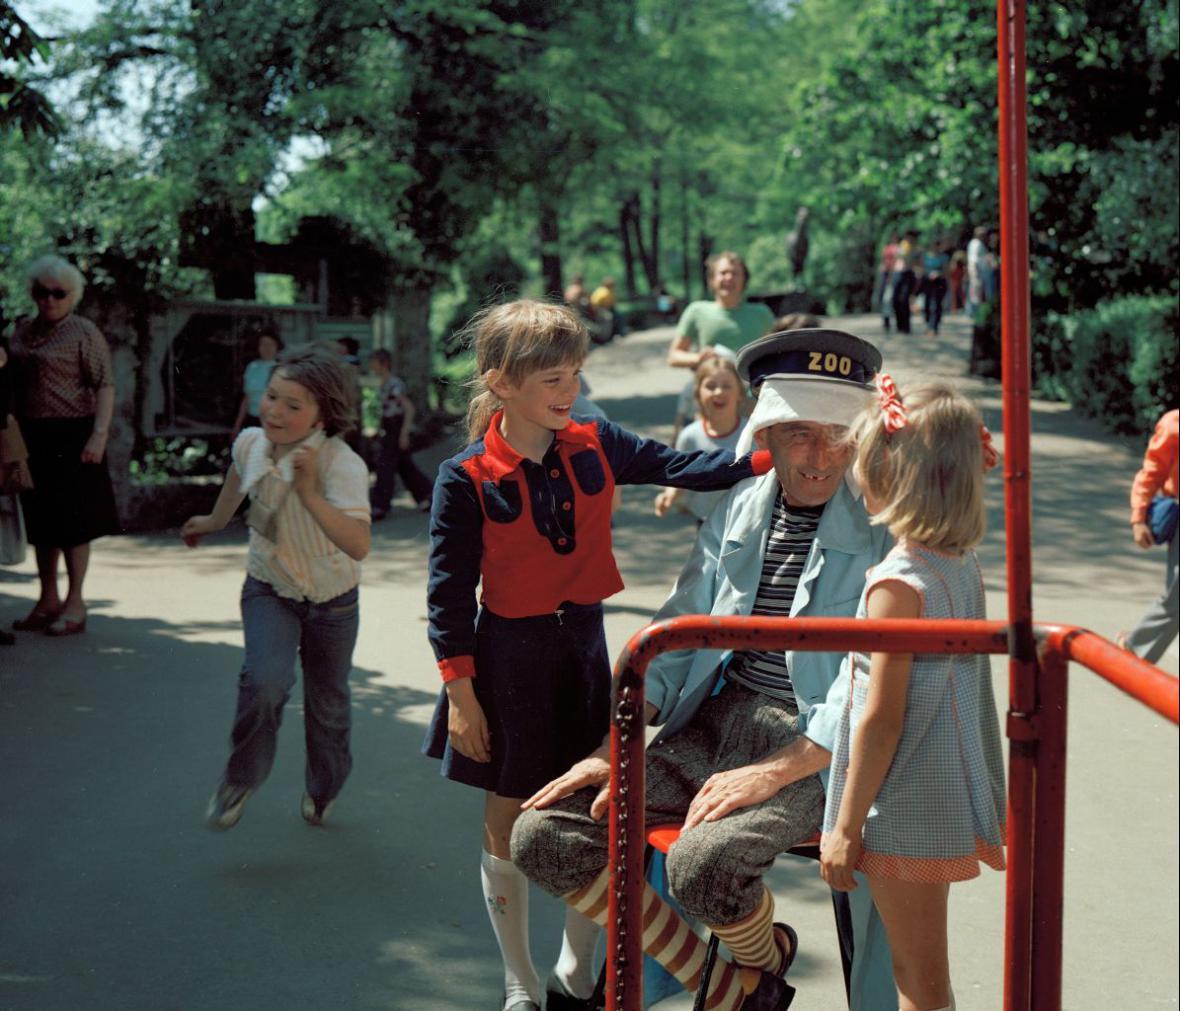 Sedmidílný cyklus Zadními vrátky do ZOO za zvířátky z roku 1978